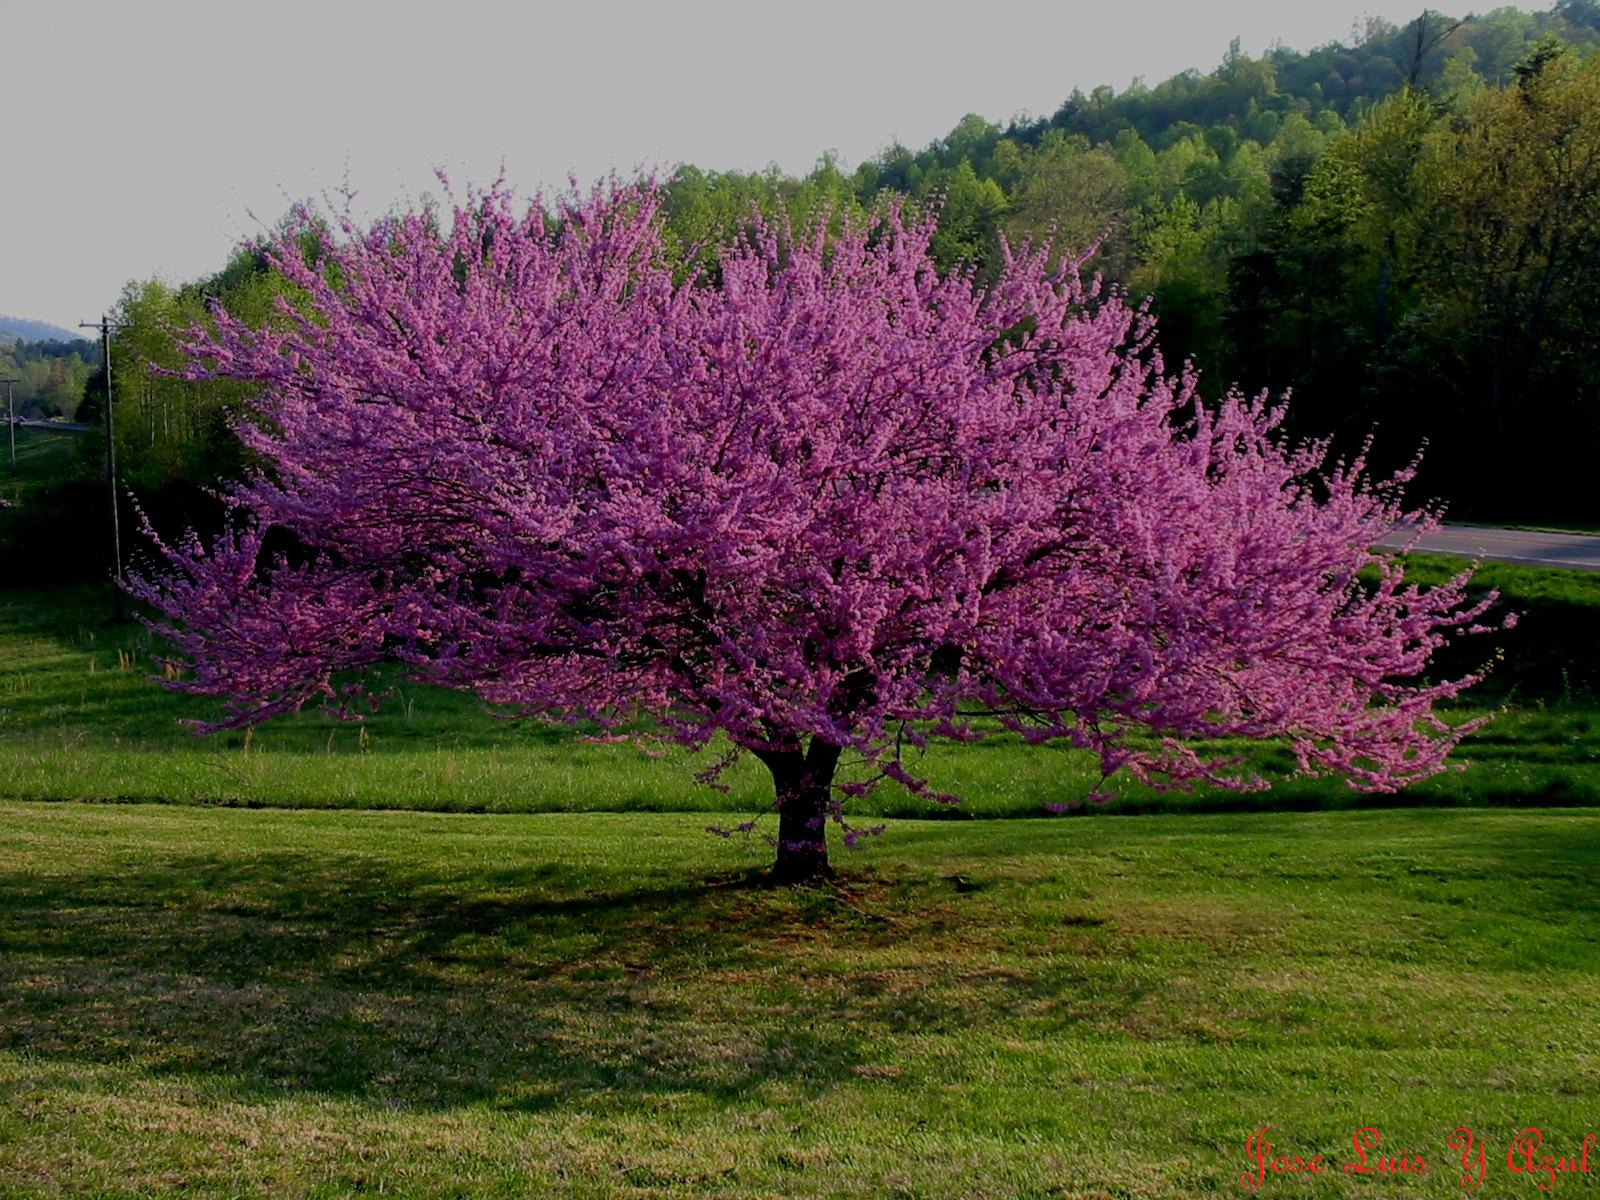 Dwaps fotos de arboles for Arboles de hoja perenne para jardin